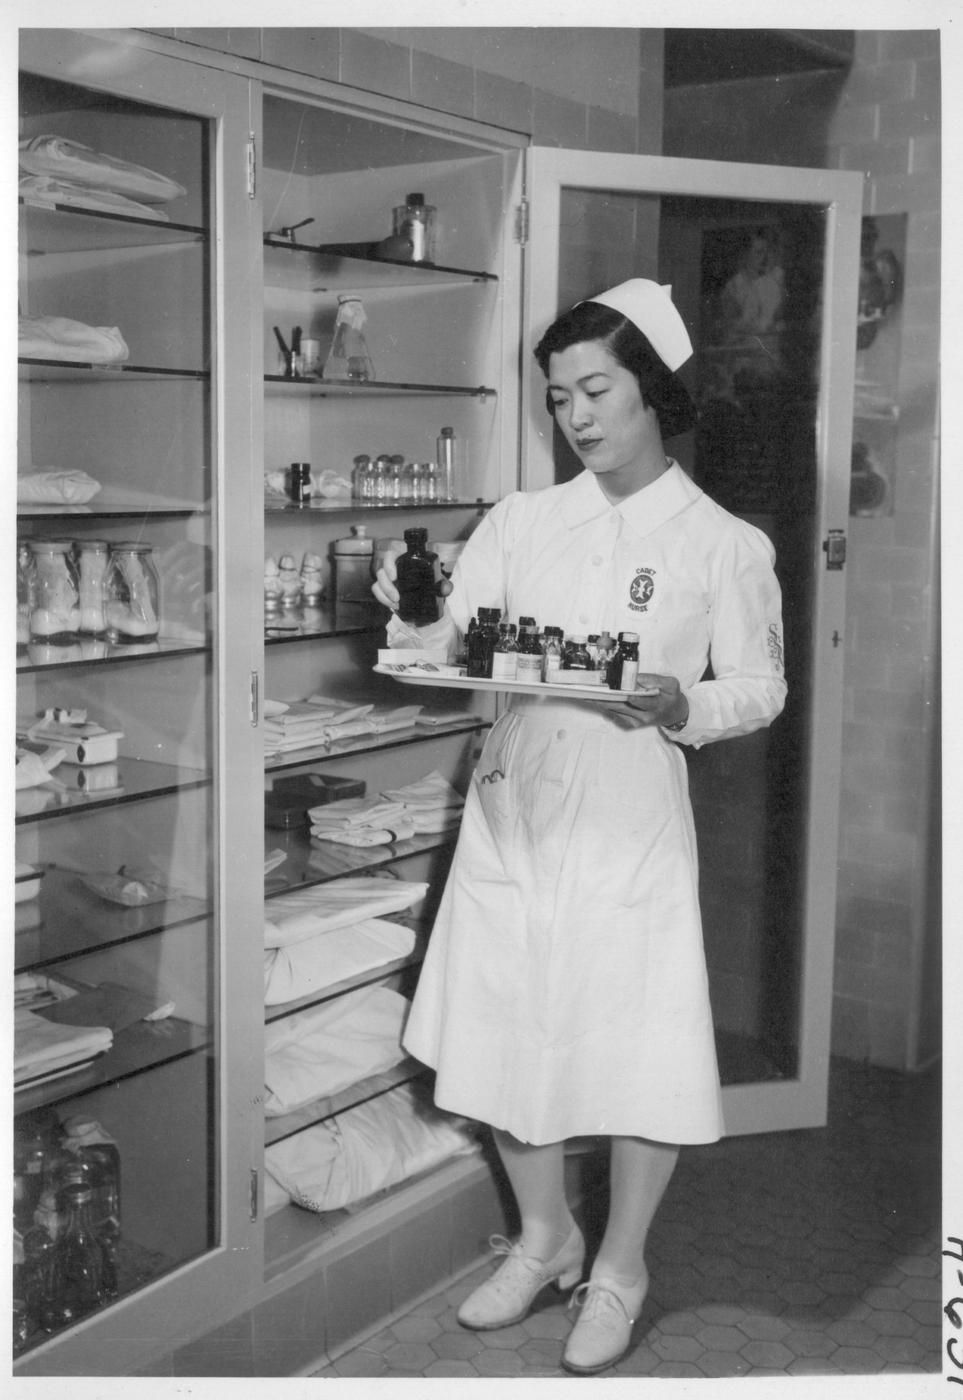 Nurse at the supply closet #nurse